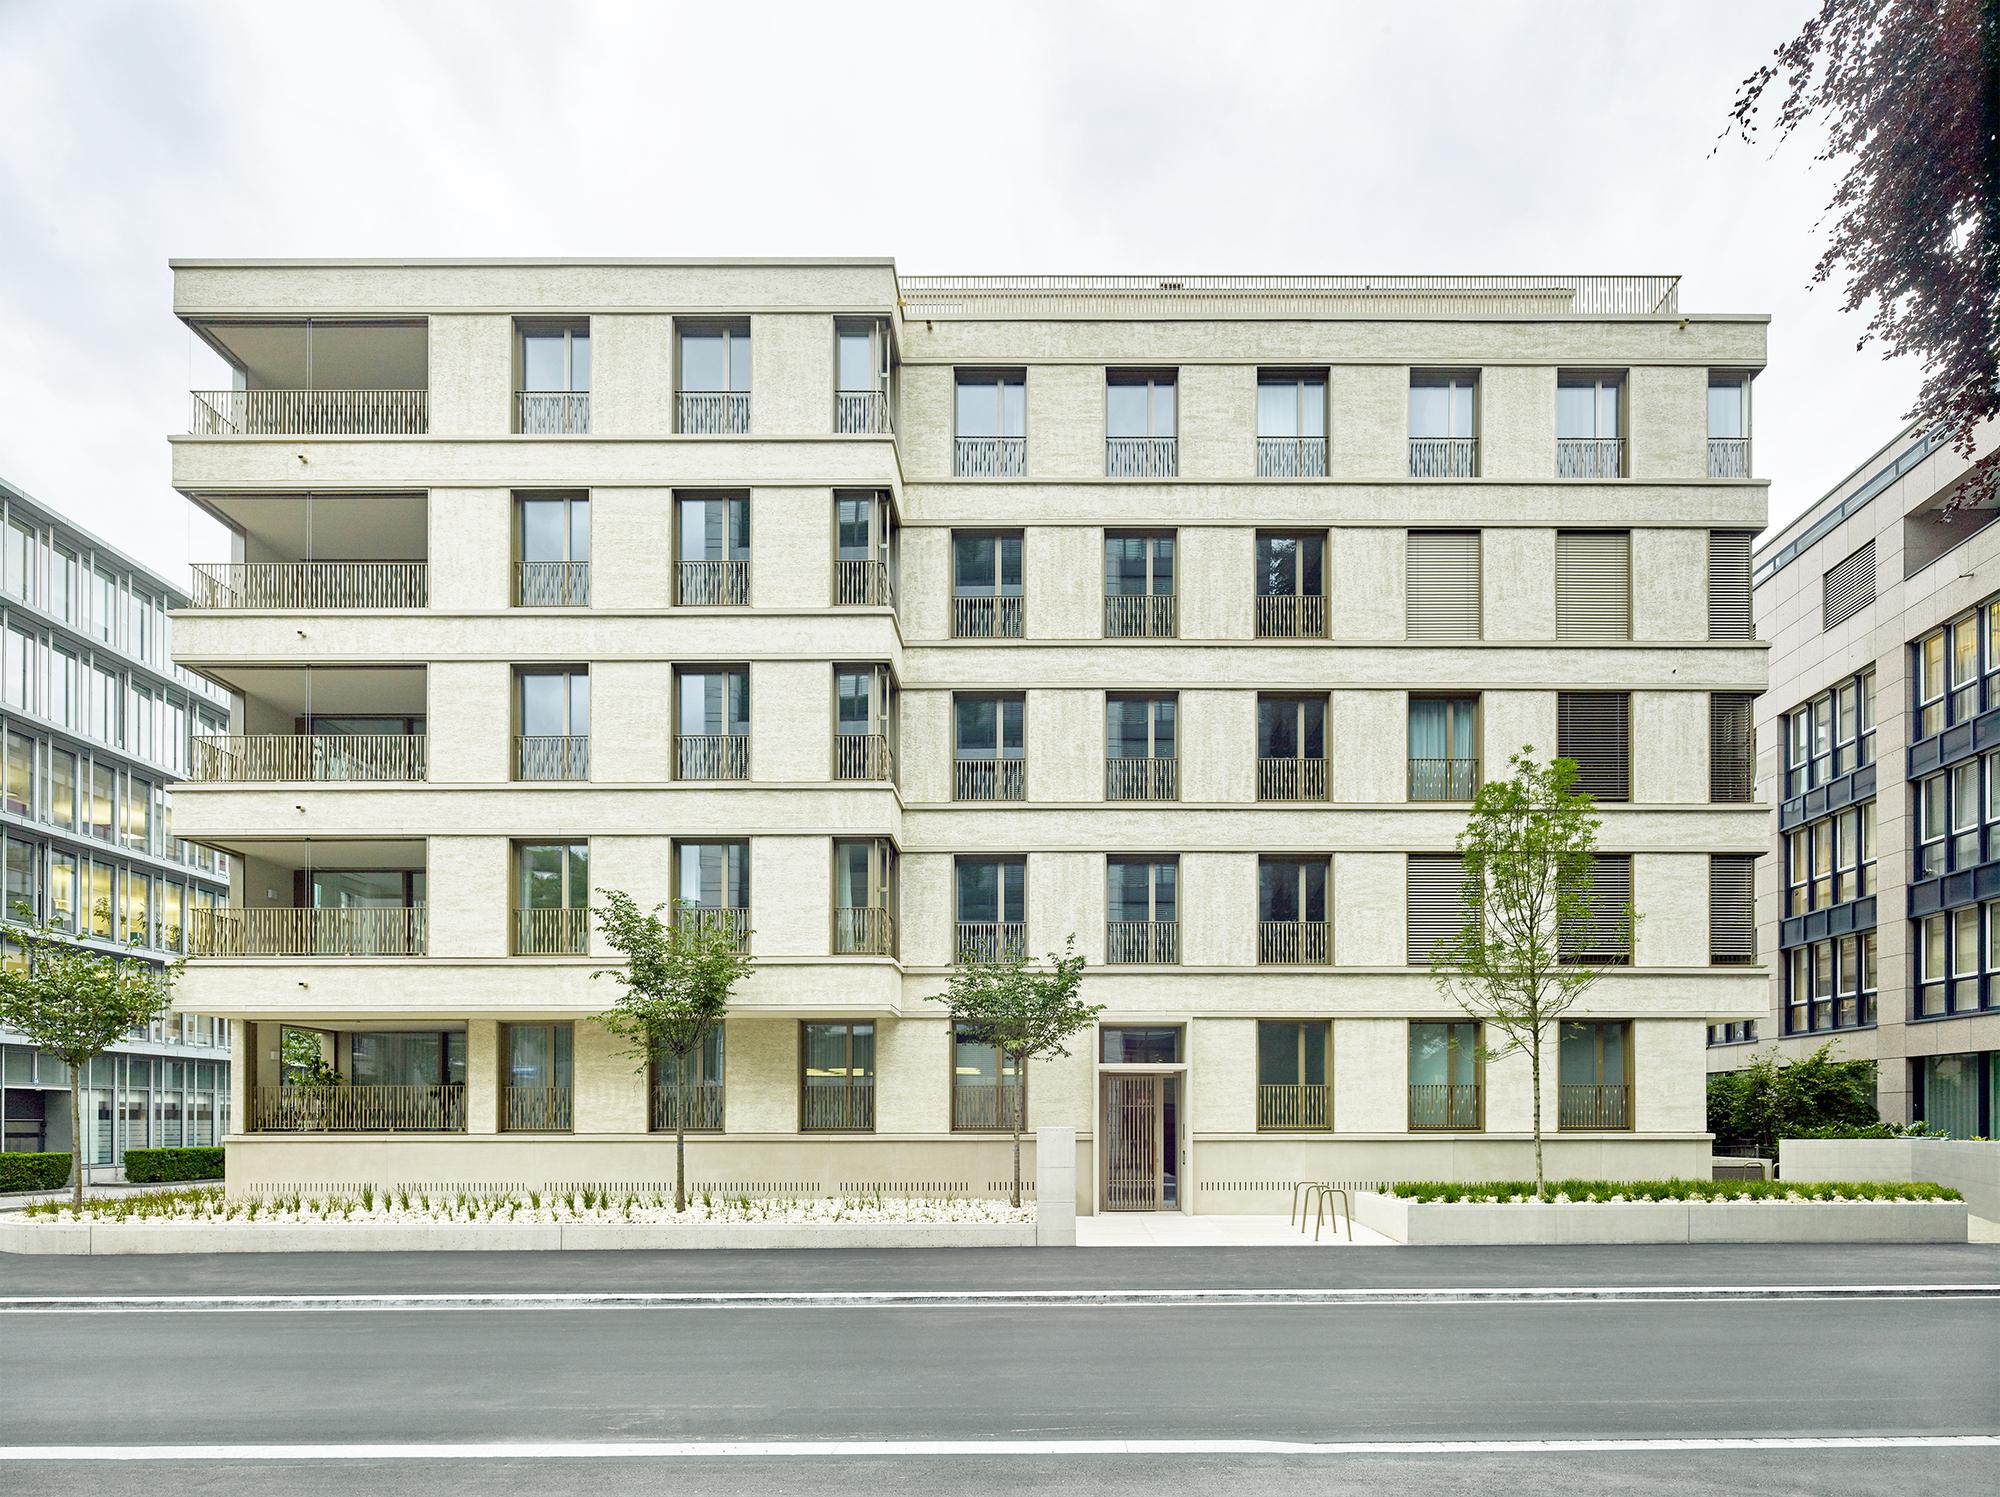 Apartment Building Tödistrasse Zürich / ADP Architects